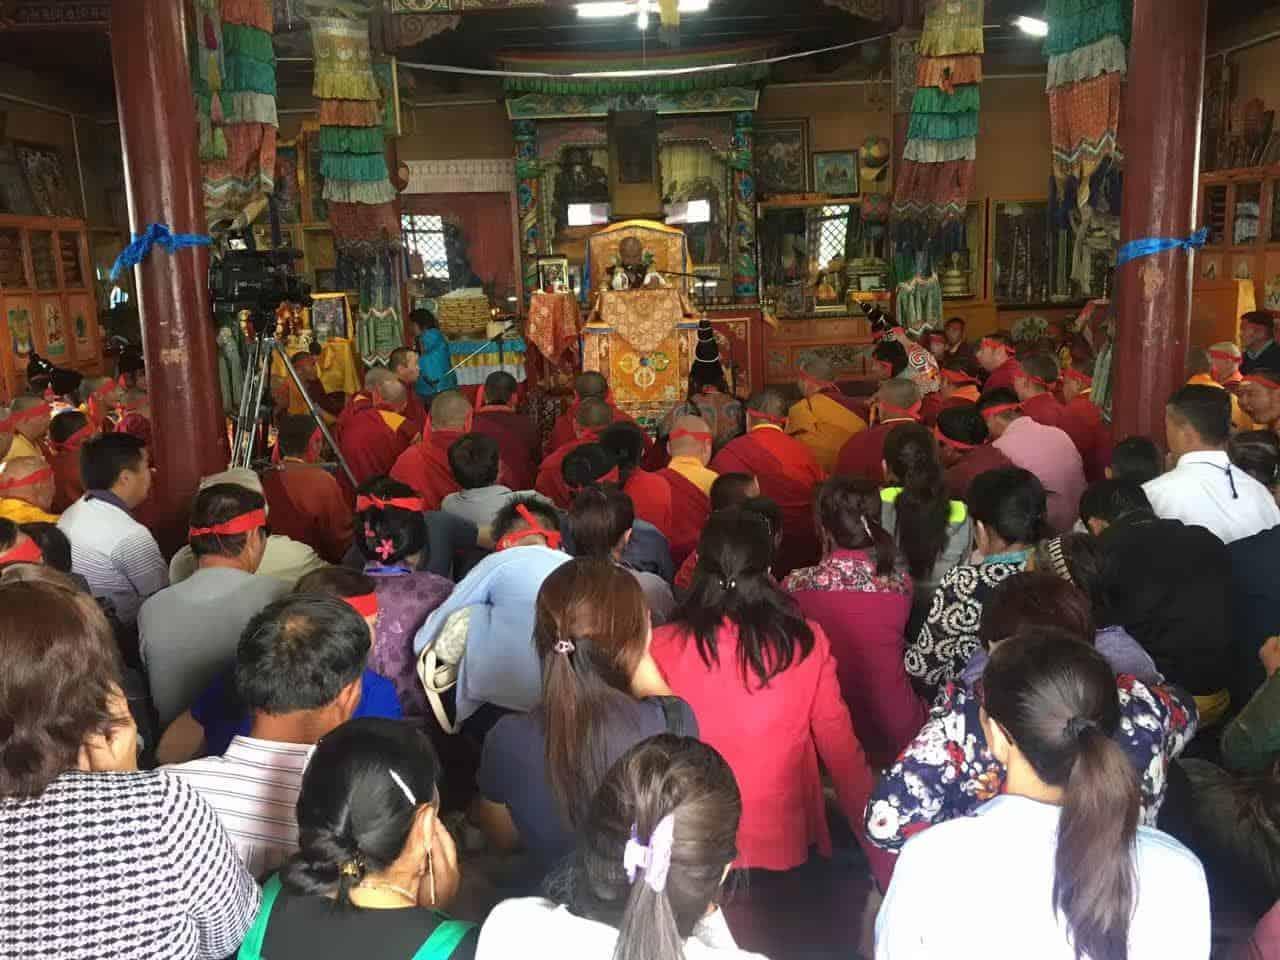 gosok-rinpoche-mongolia-2016-ae72ed9bd34861625f78441ebf7f712